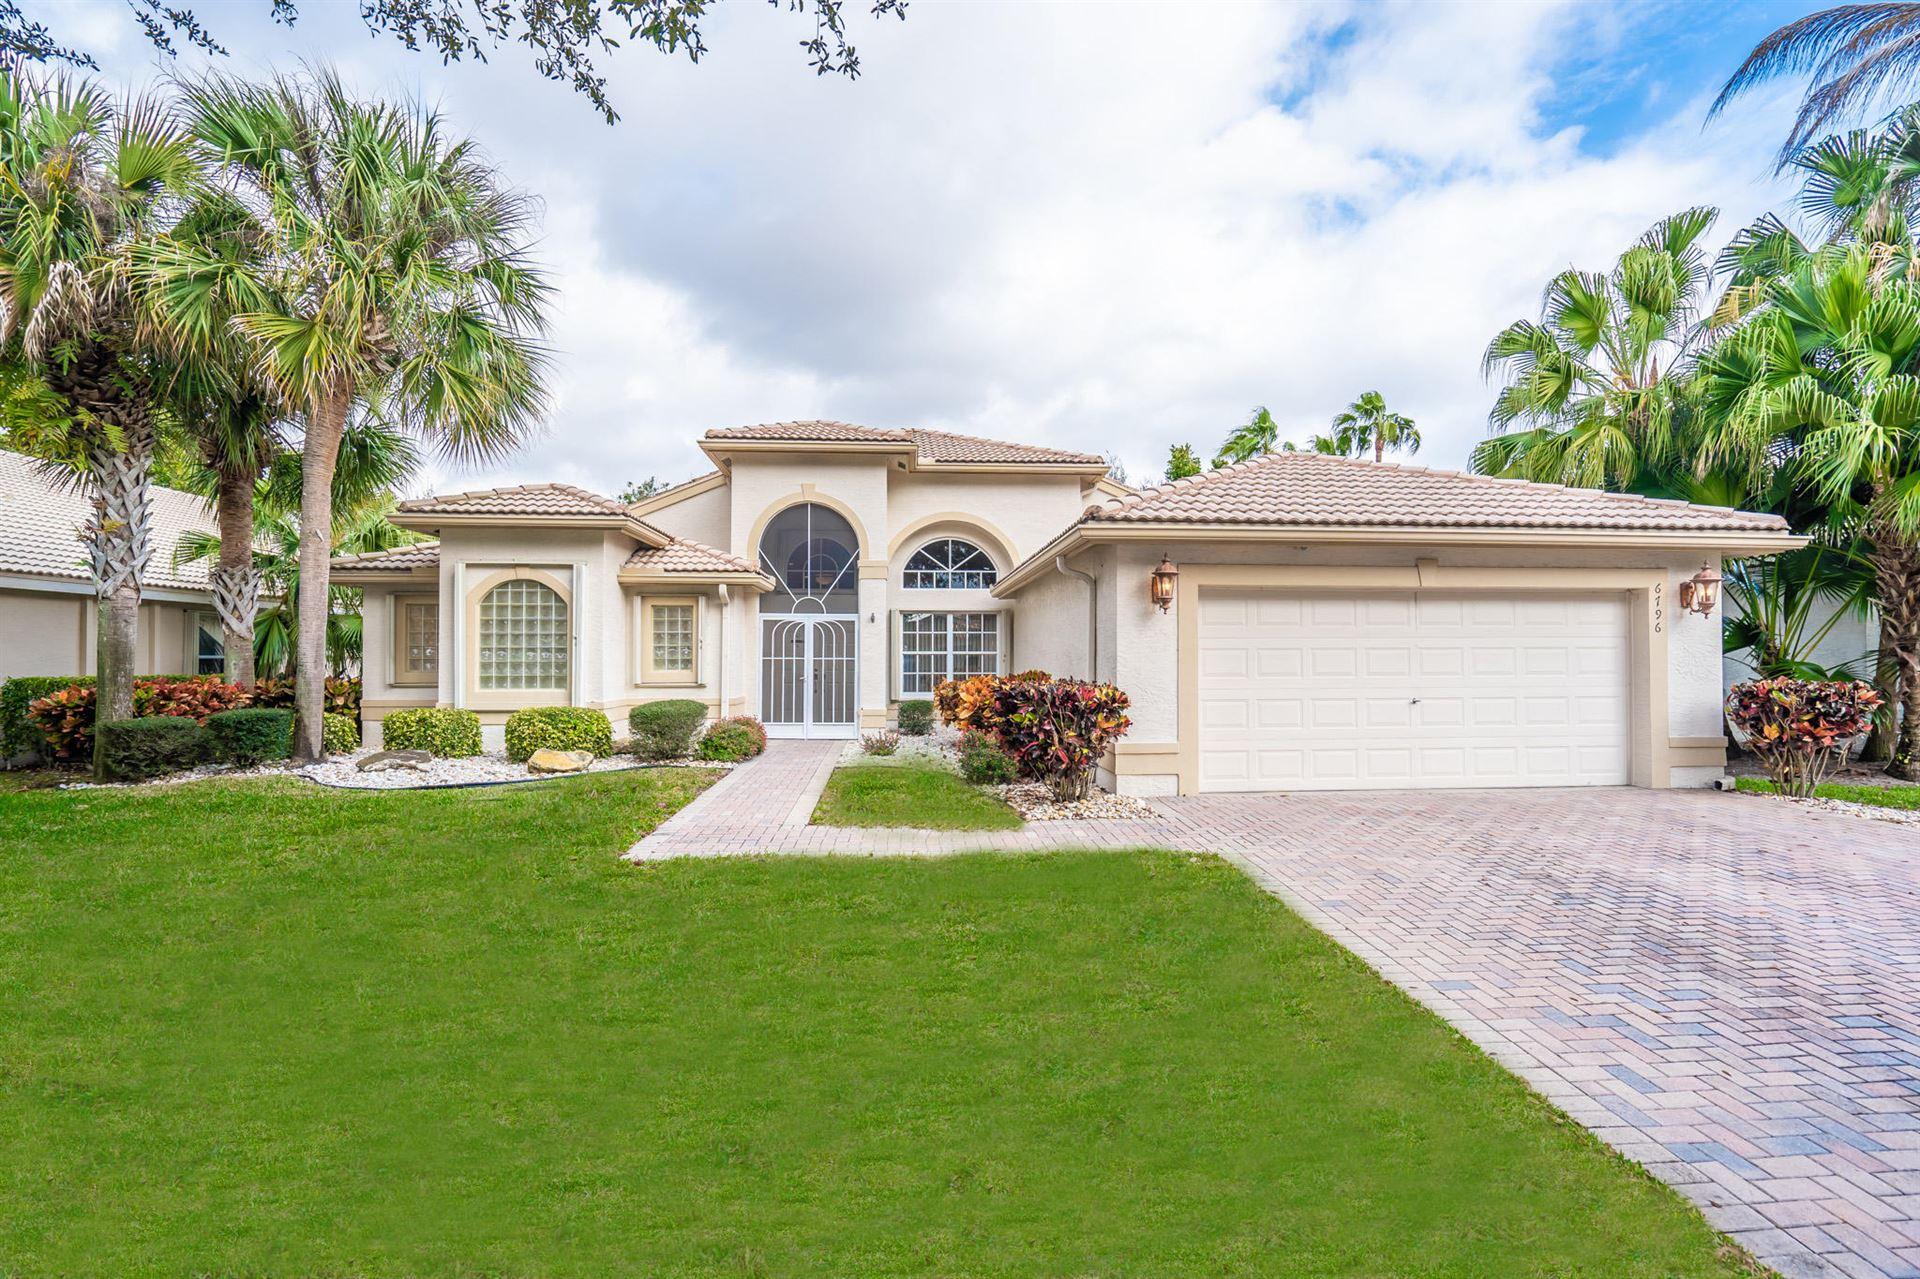 6796 Molakai Circle, Boynton Beach, FL 33437 - #: RX-10599395